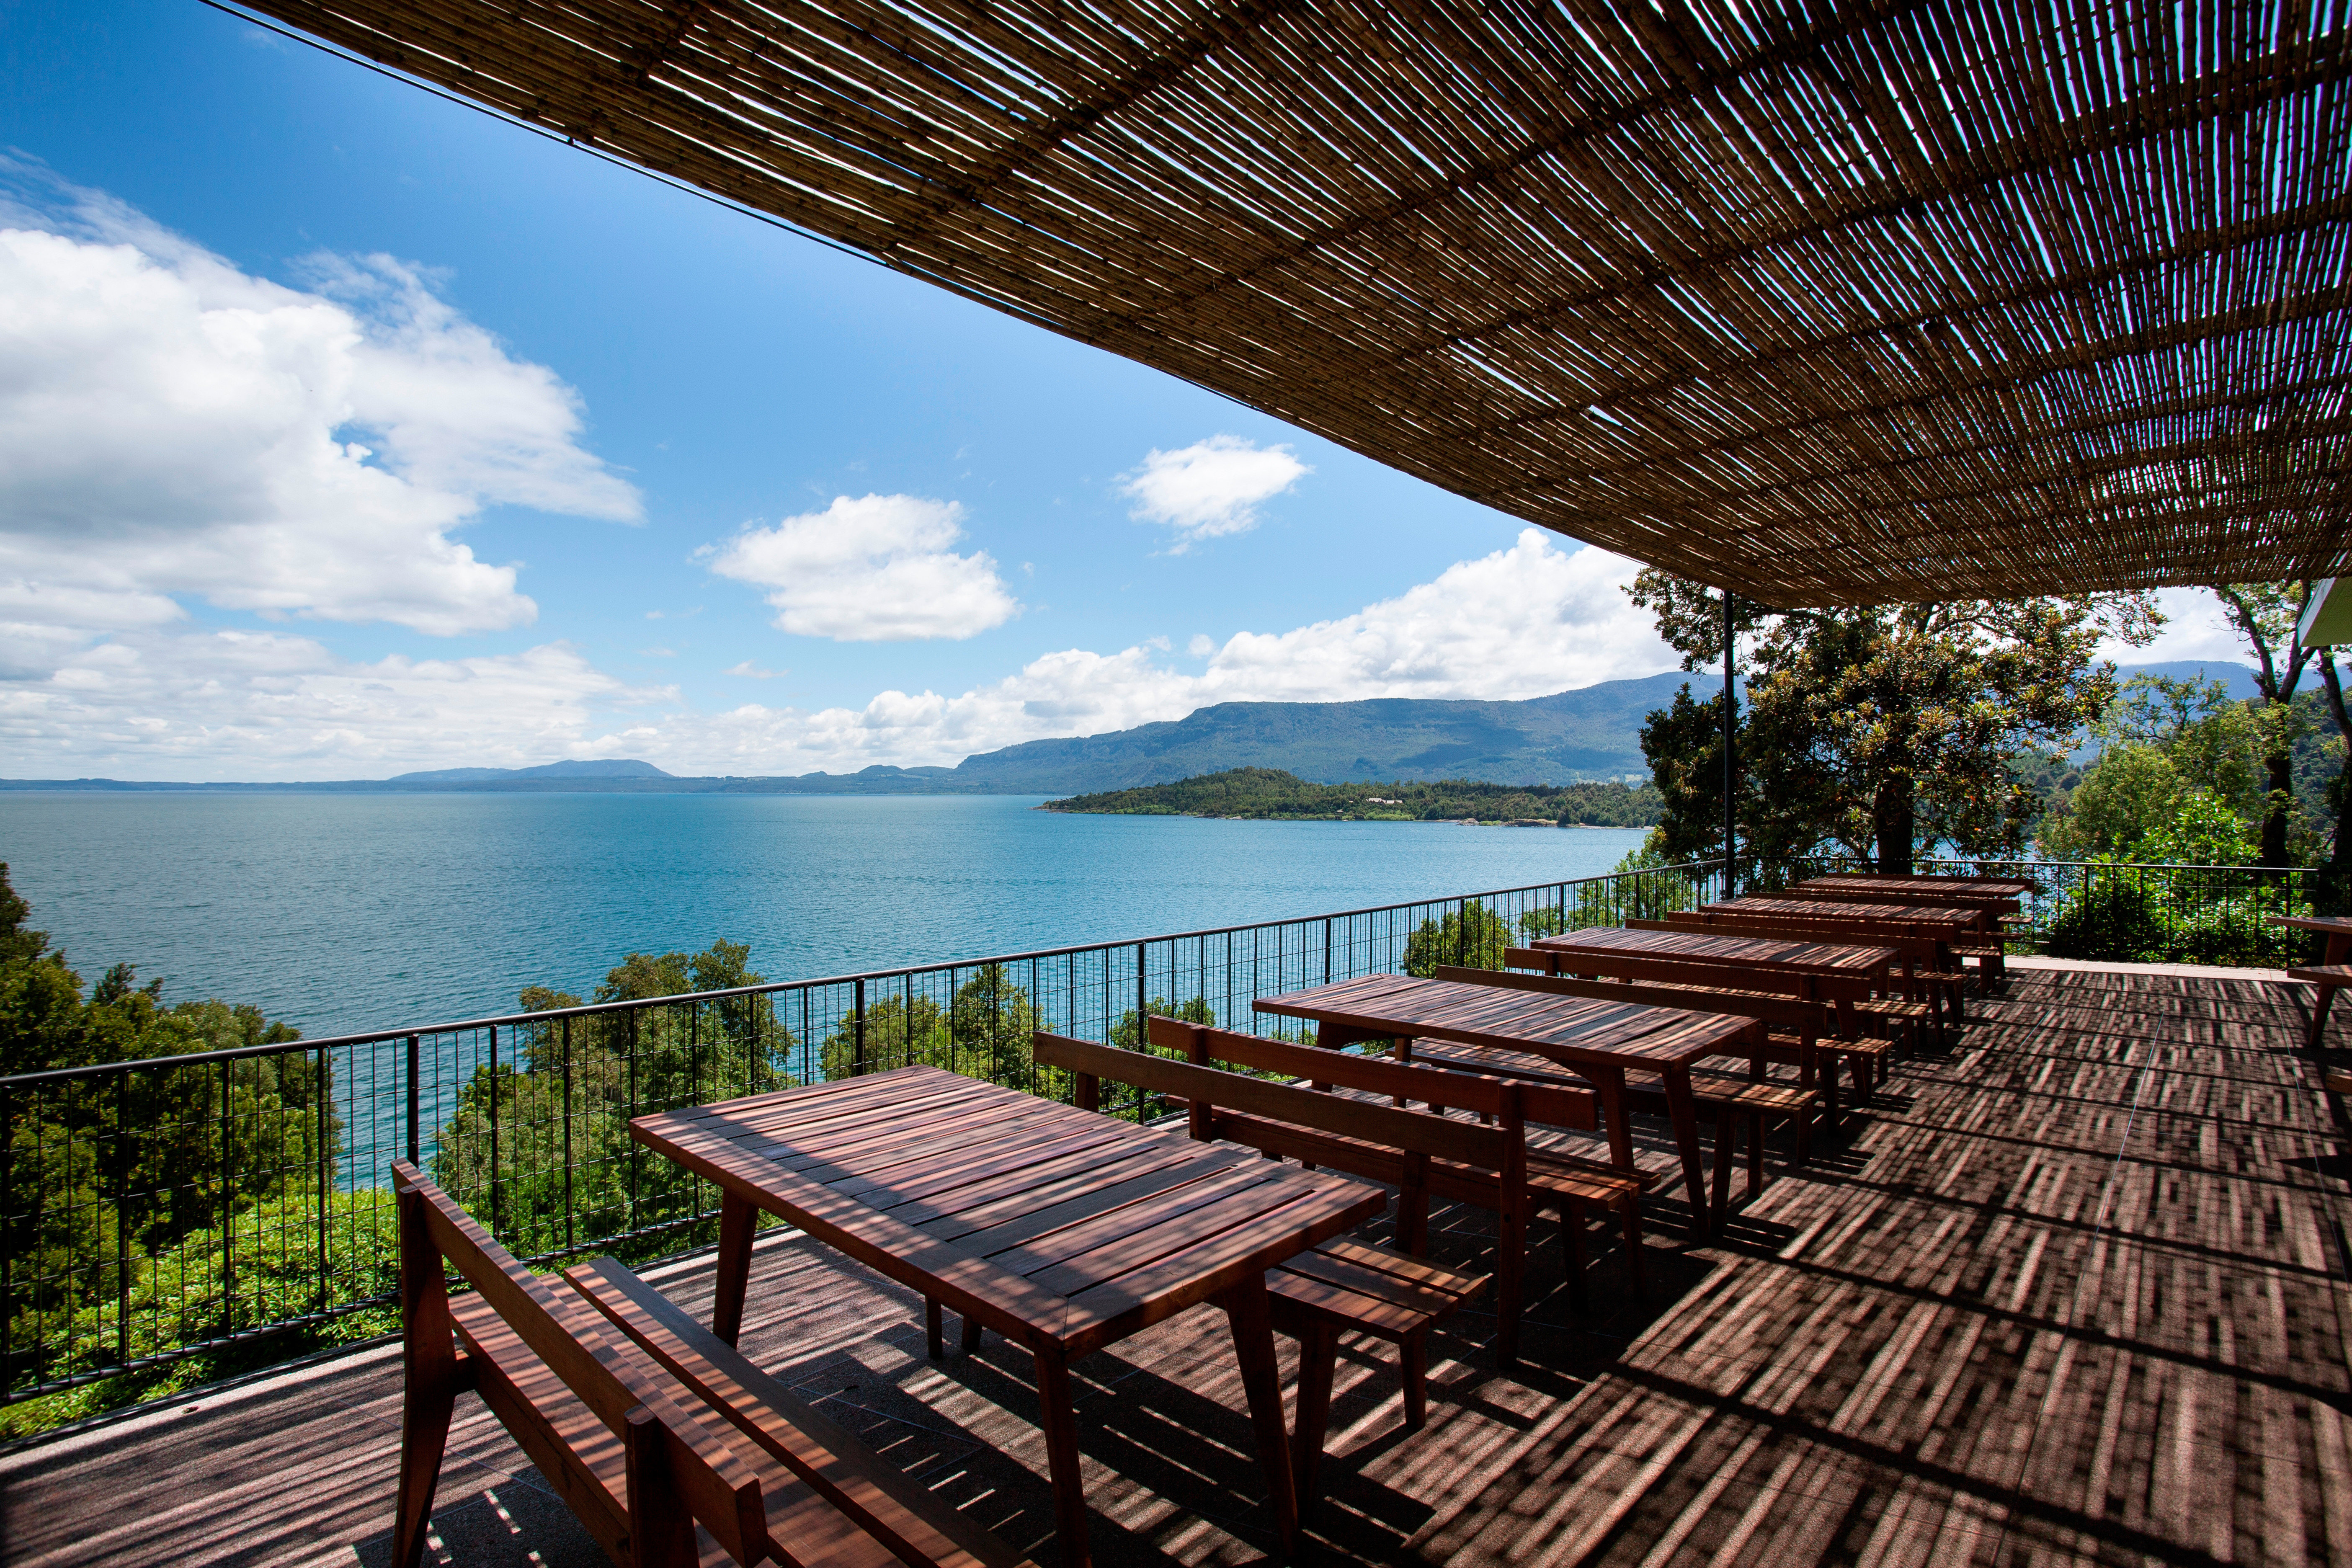 Lounge Luxury Nature Outdoors Resort Rooftop Scenic views bench sky wooden swimming pool park metal walkway